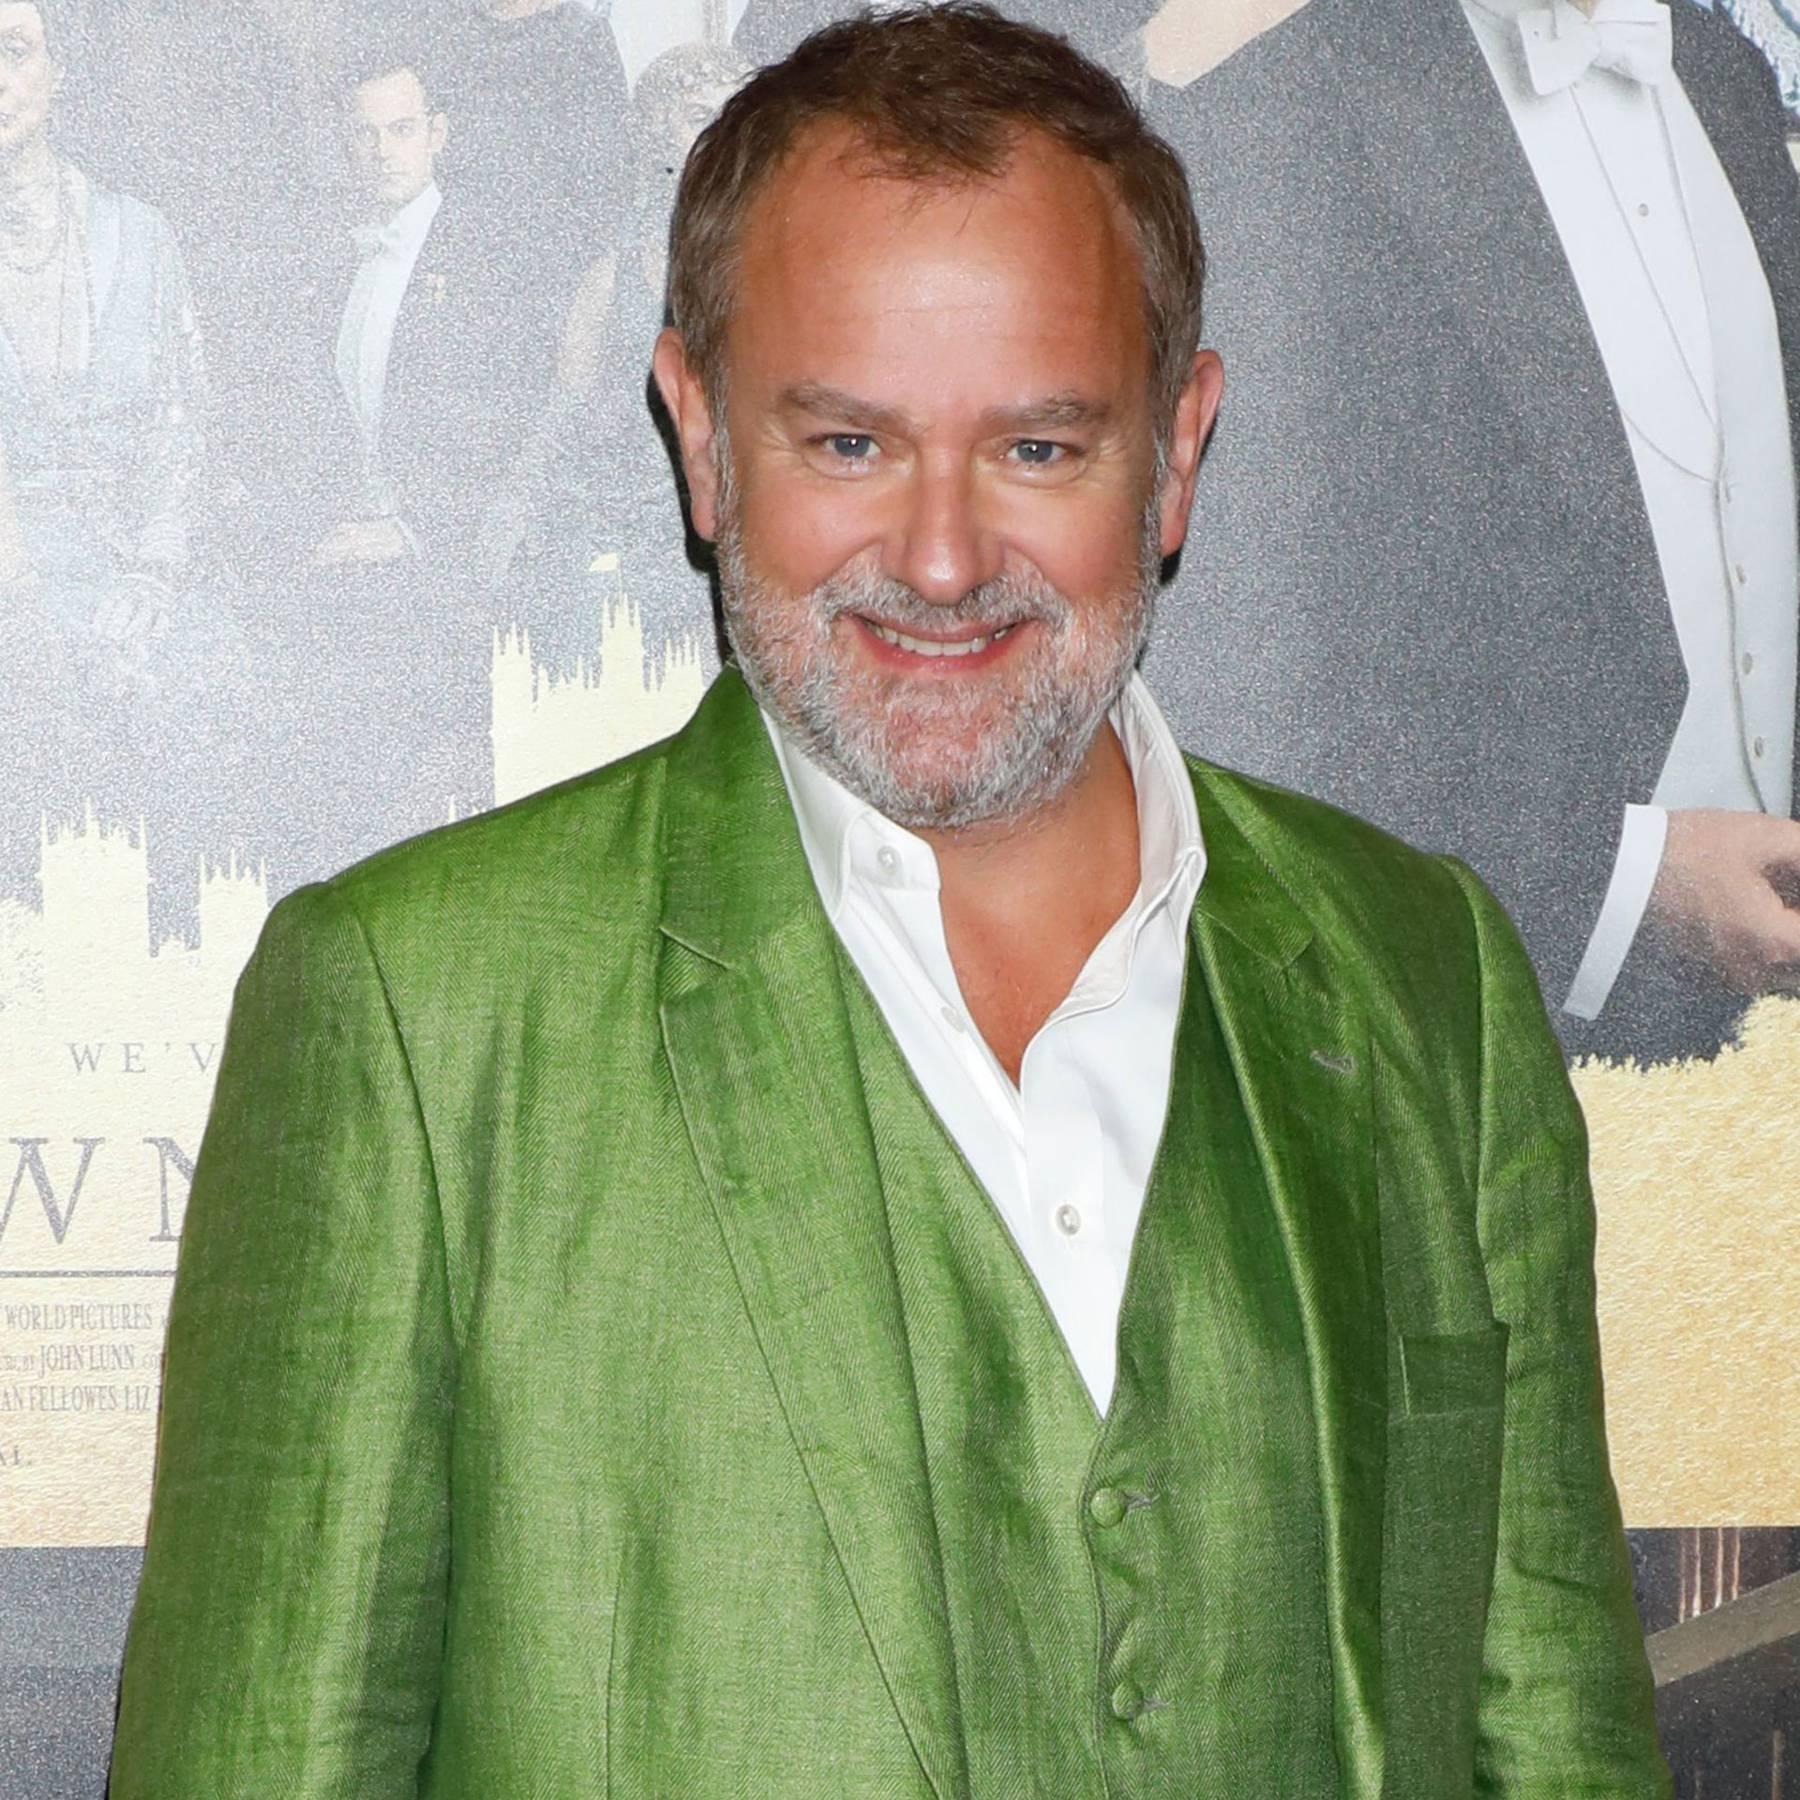 Downton Abbey's Hugh Bonneville gains a real-life royal title